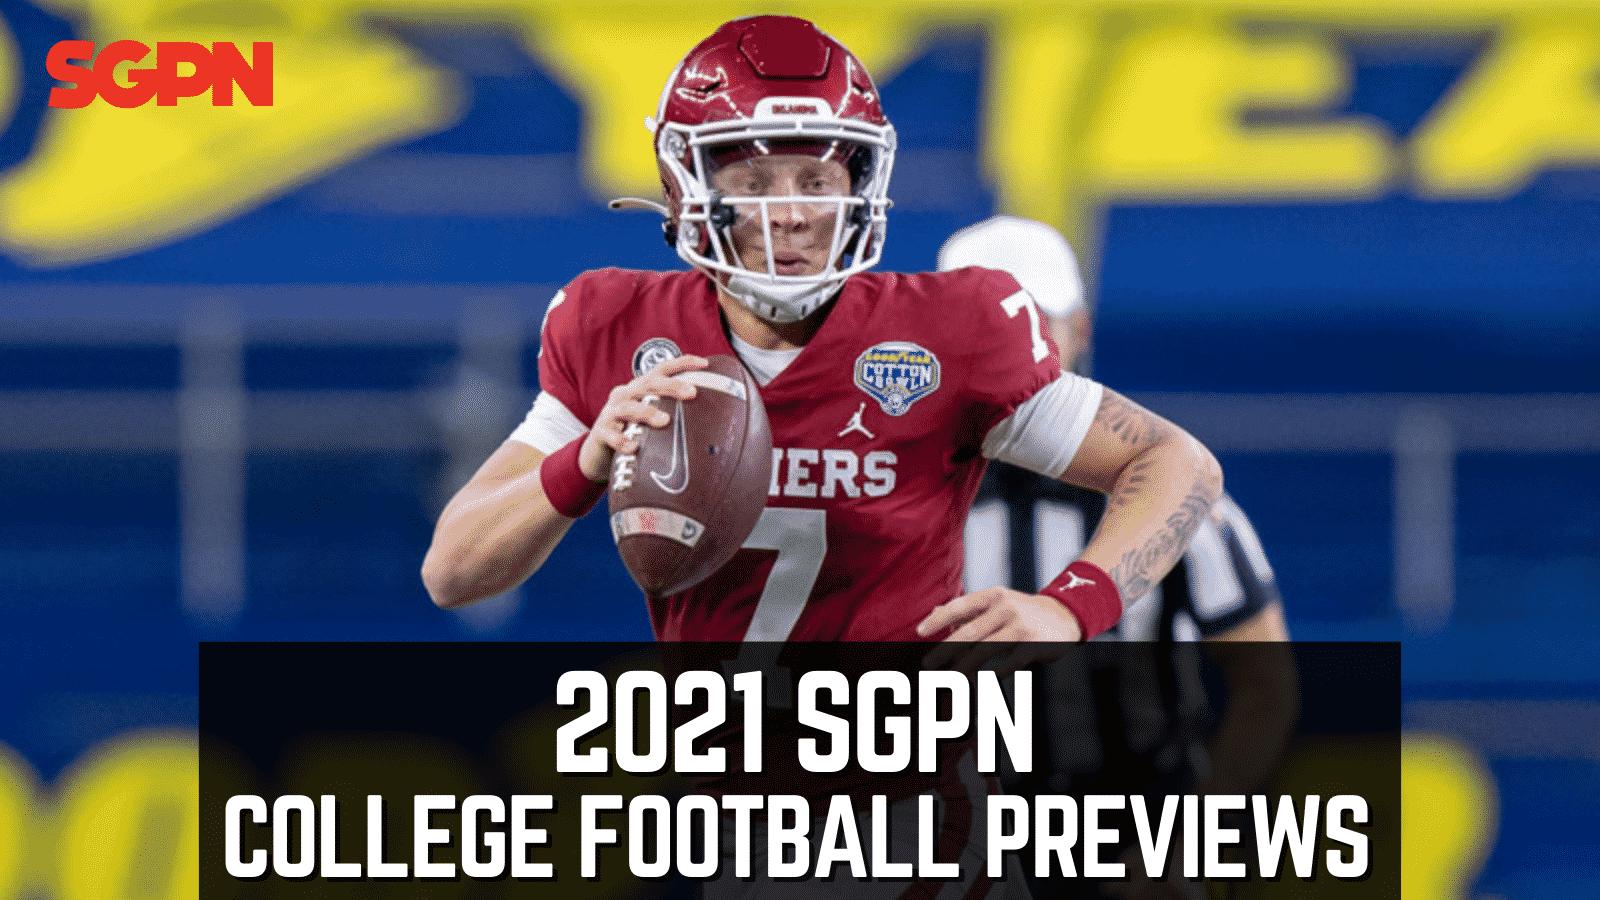 College-Football-Season-Previews-130-Team-Previews